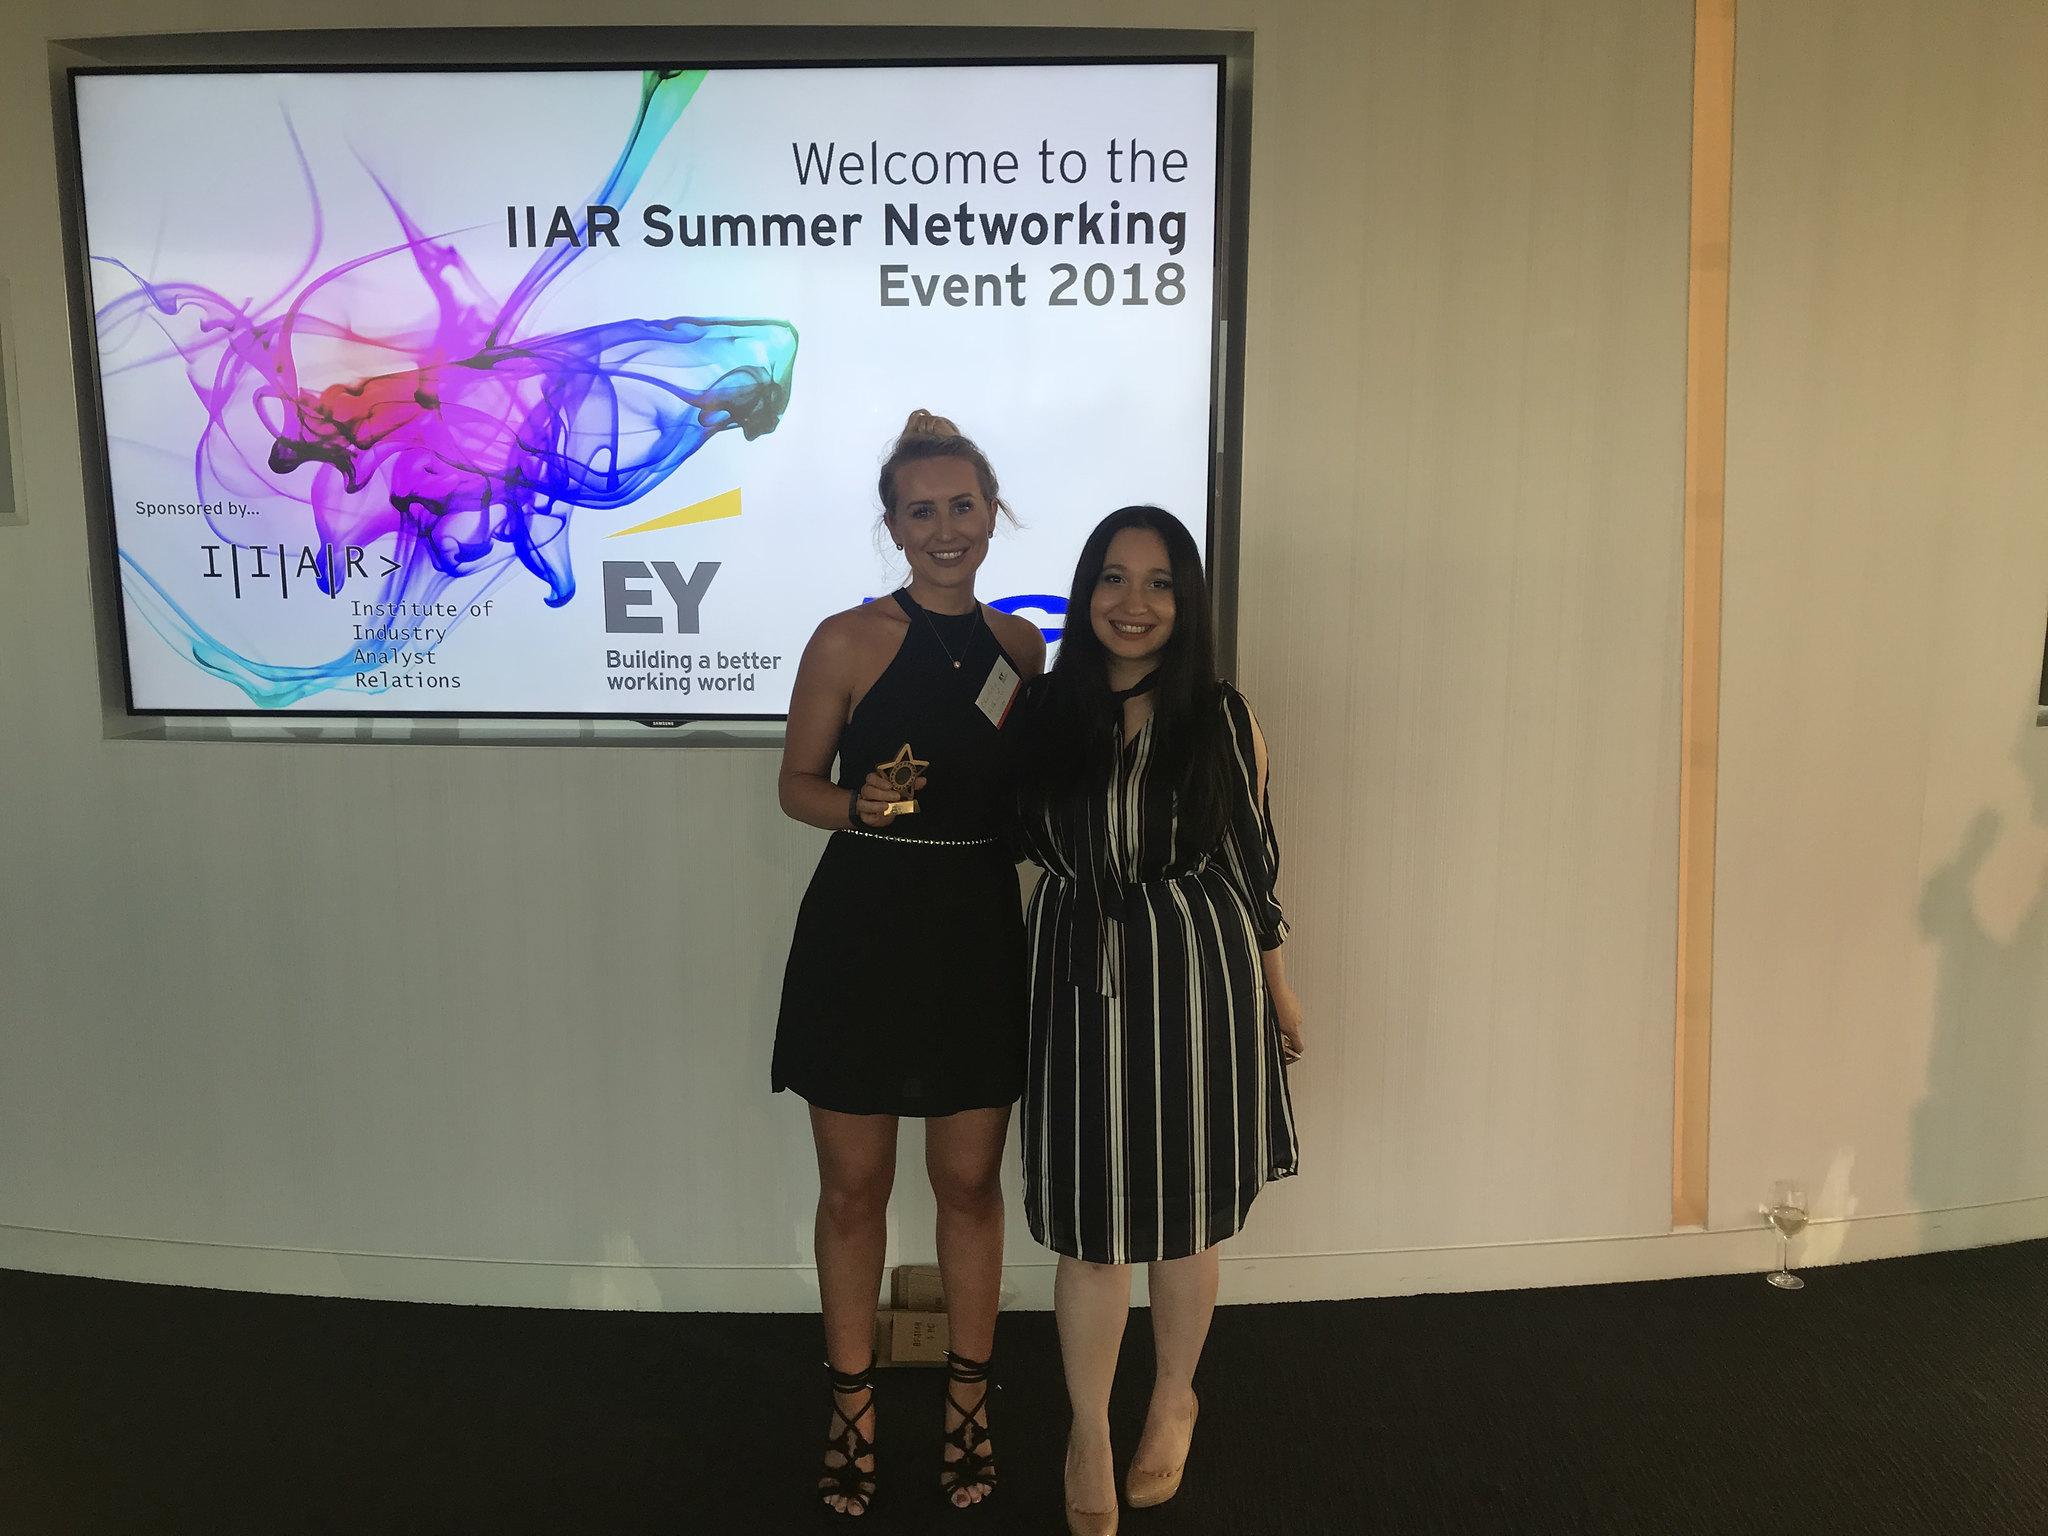 IIAR London Summer Networking Event - July 2018